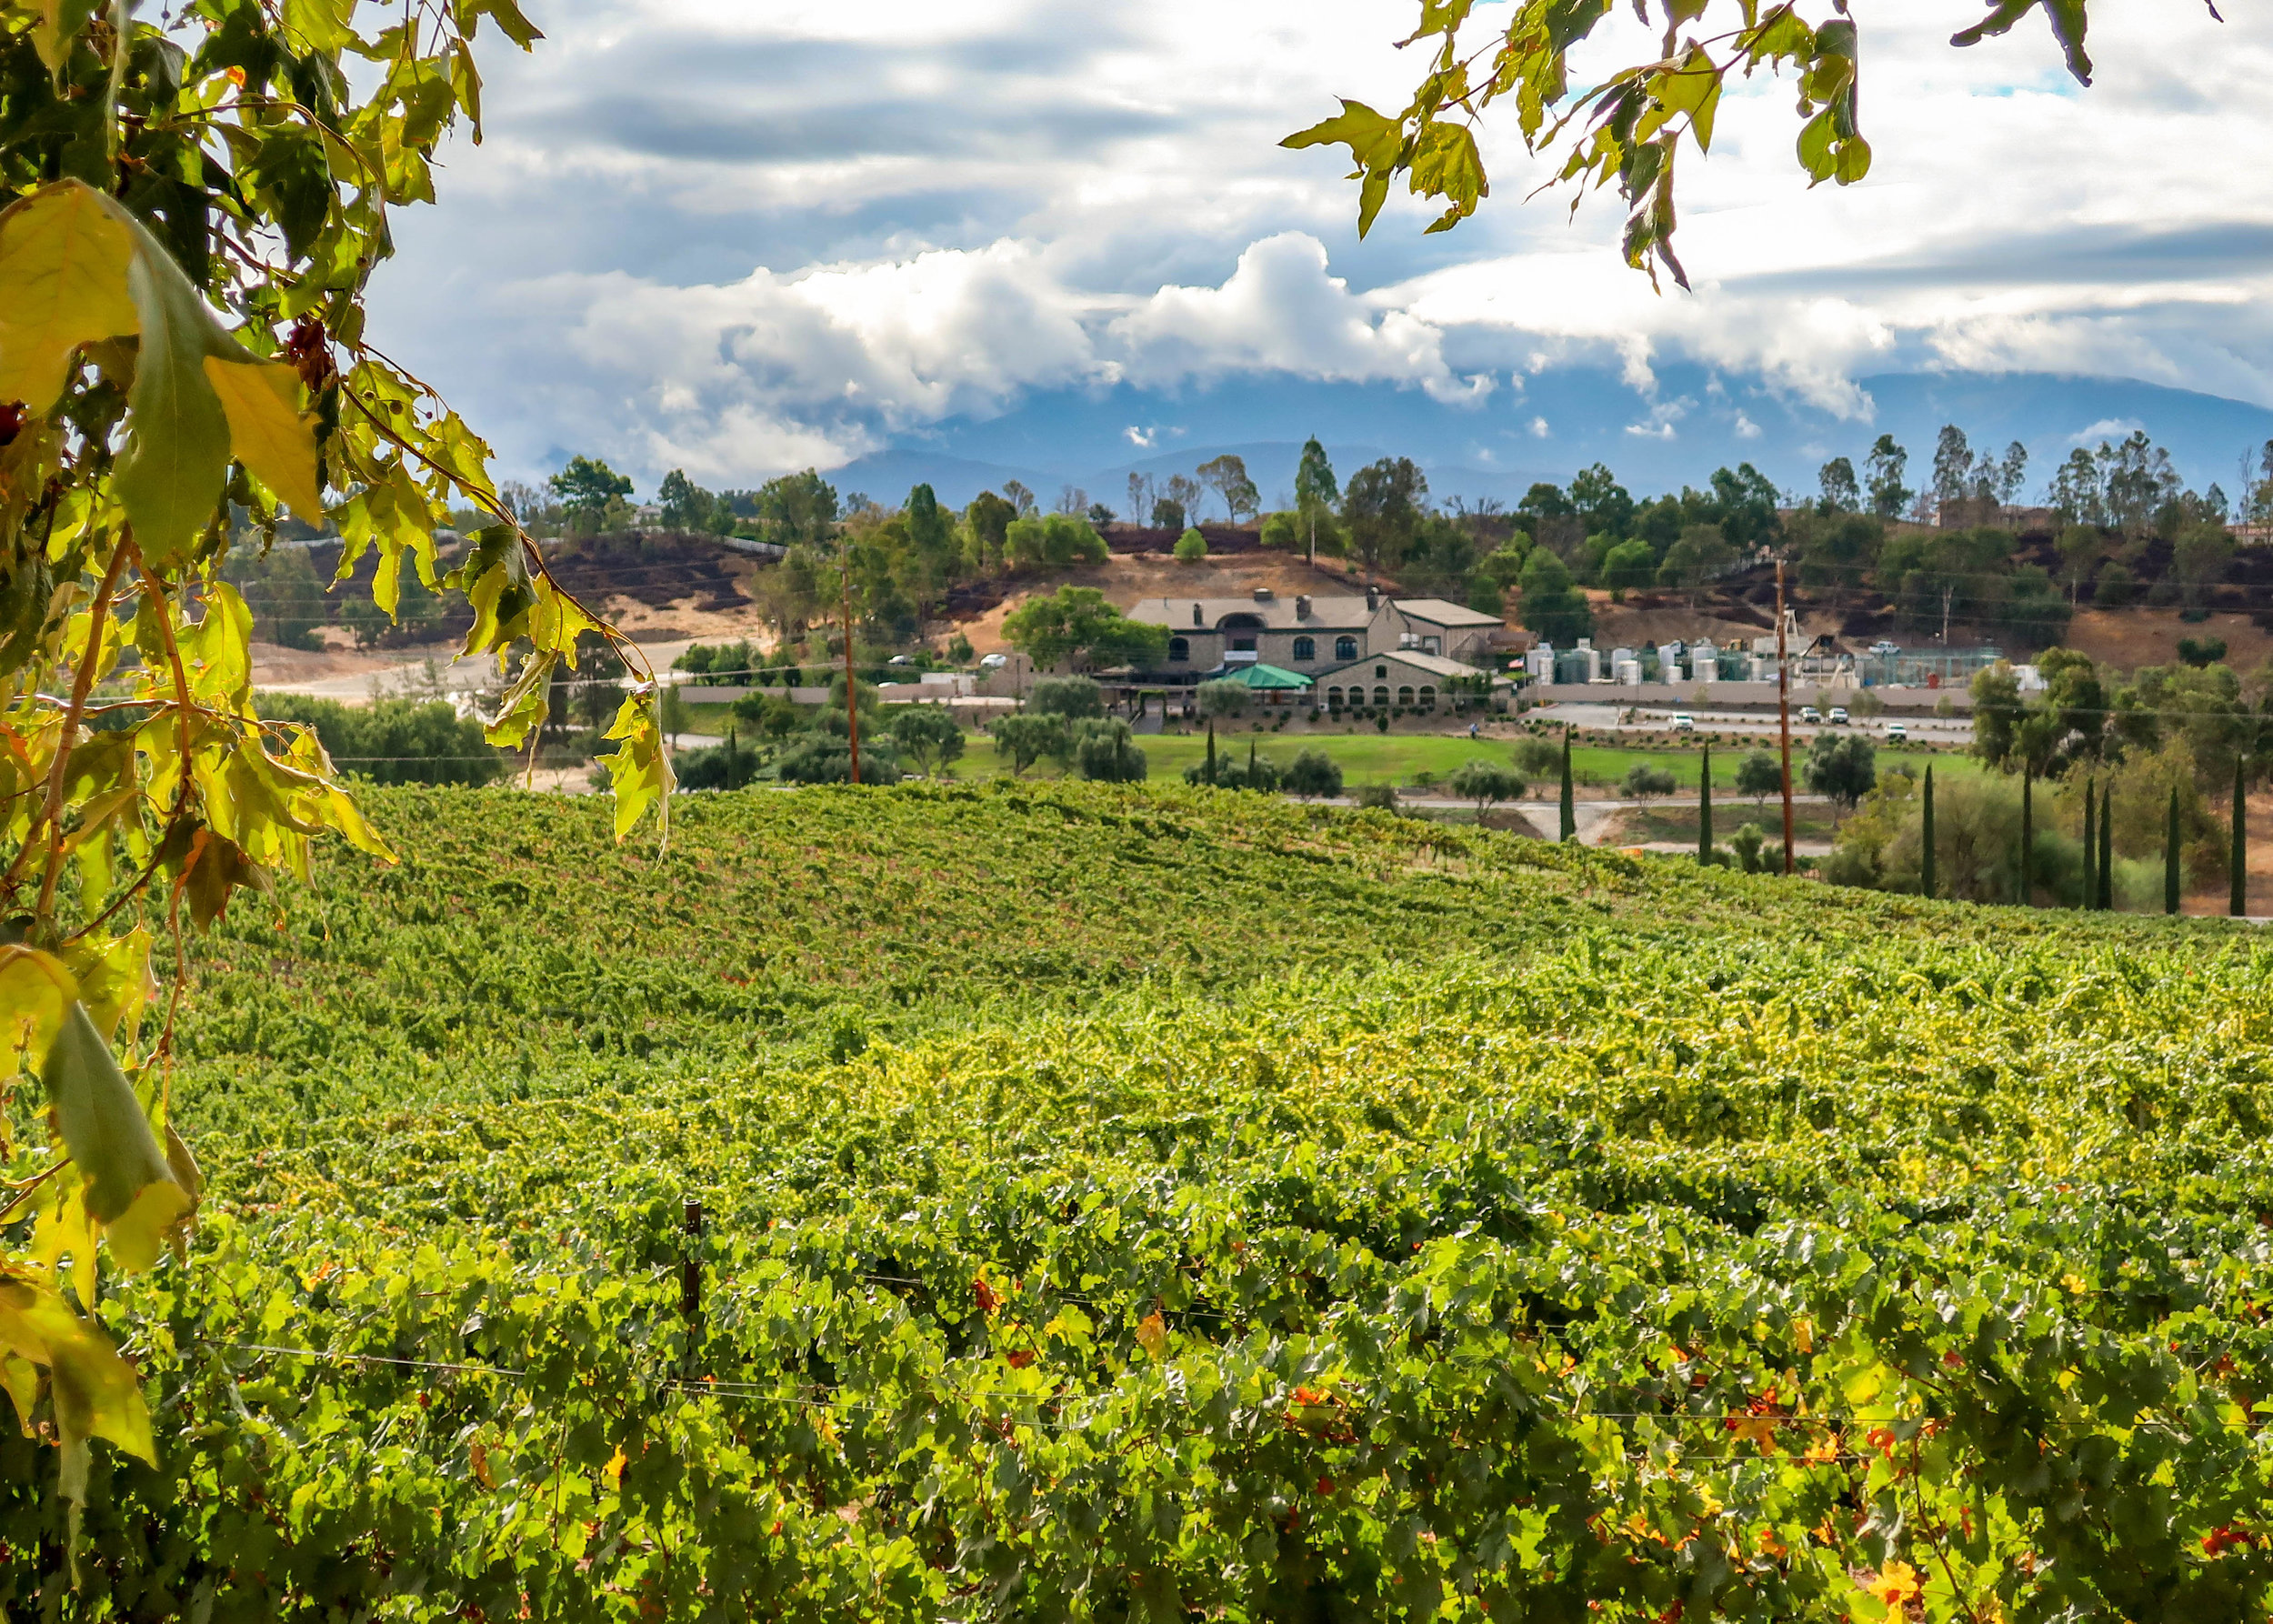 Thornton Winery in Temecula